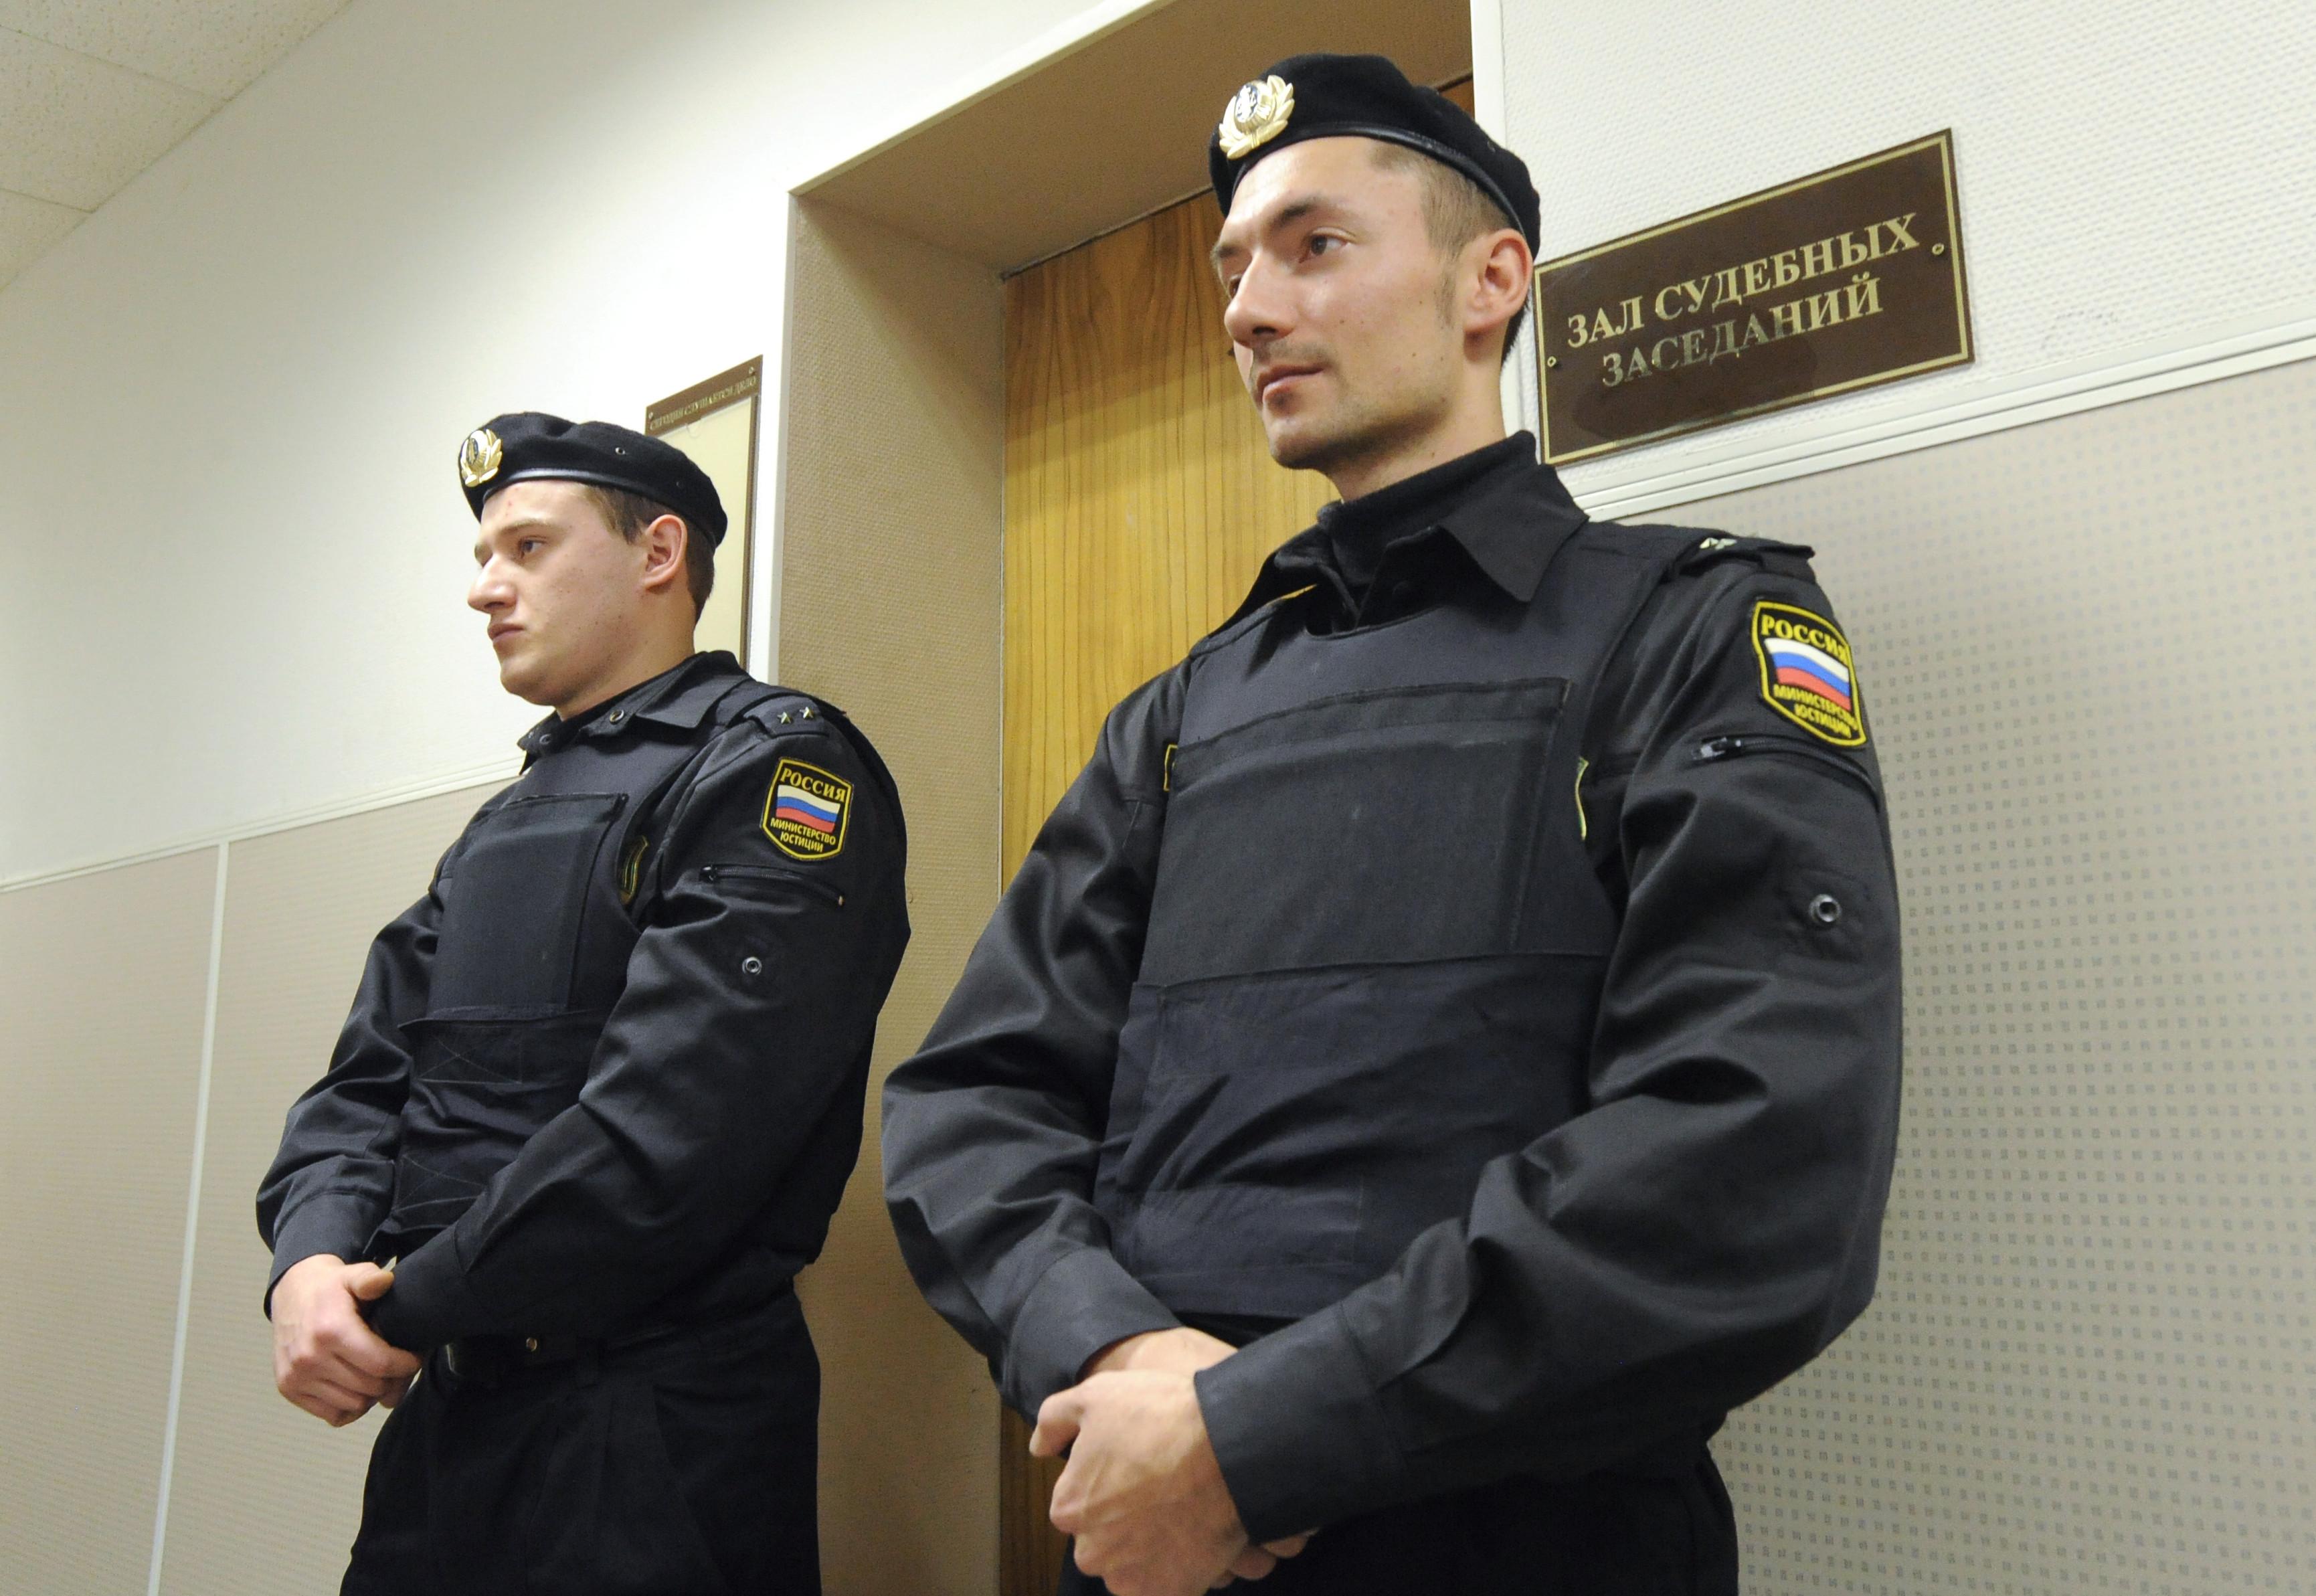 Фото © РИА Новости/Сергей Пятаков